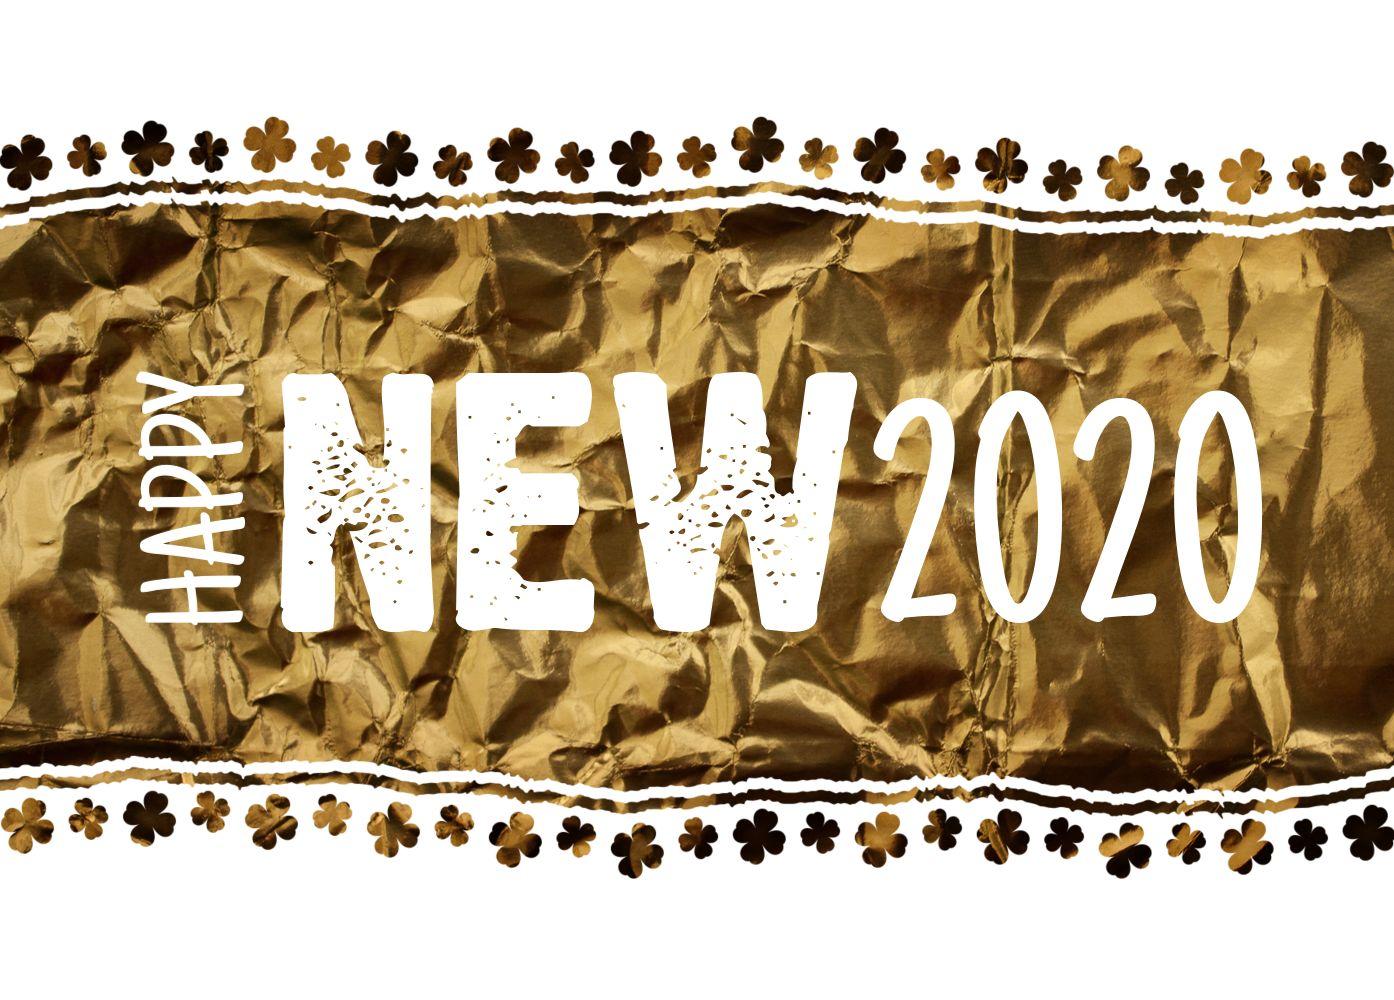 Ansicht 2 - Neujahrskarte Kleeblatt